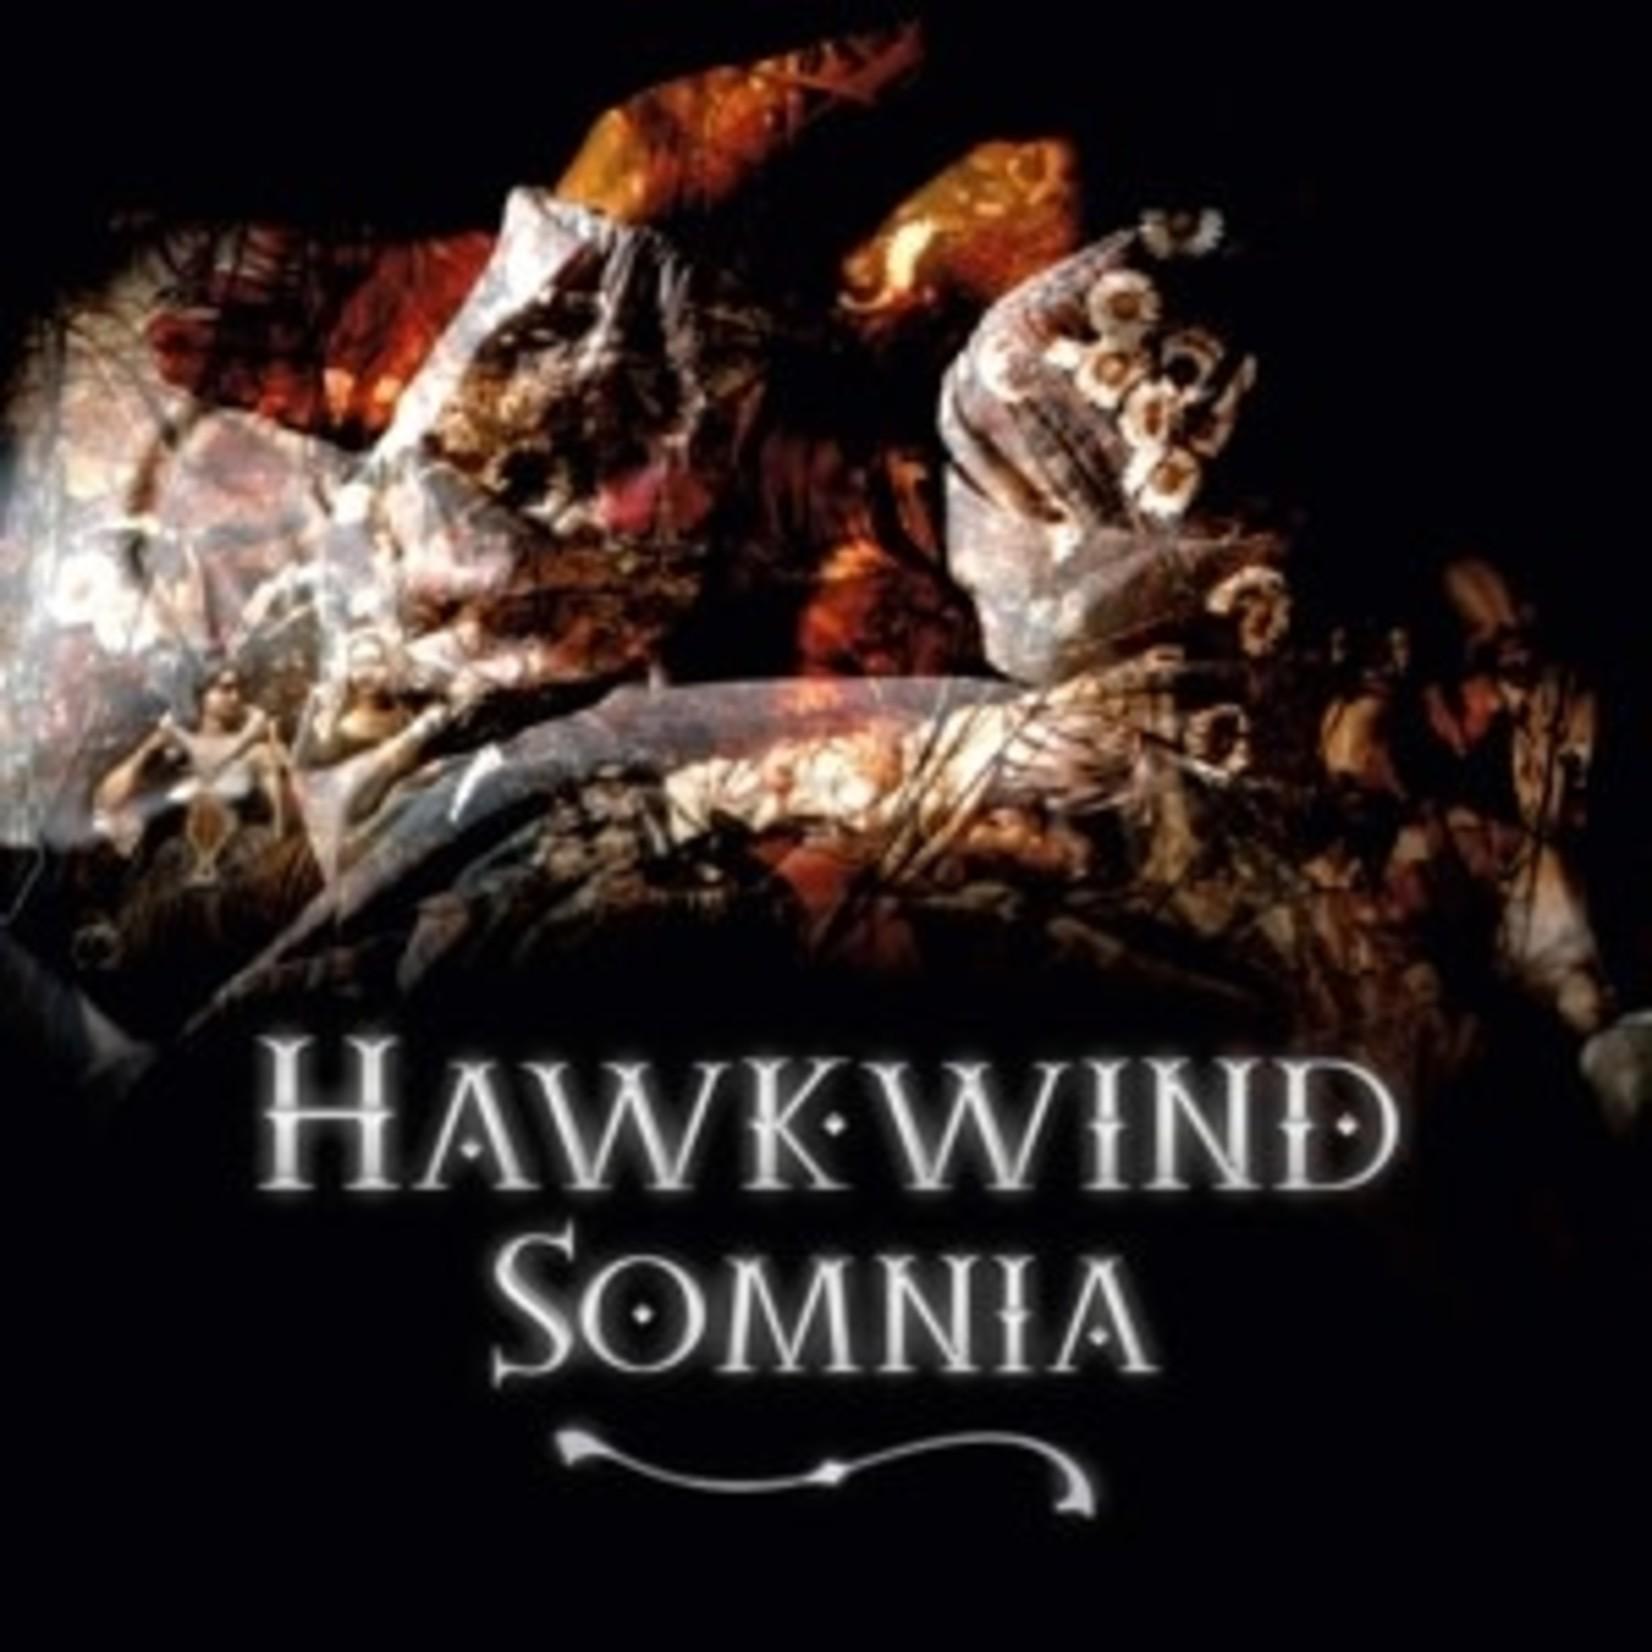 HAWKWIND - SOMNIA (CD)